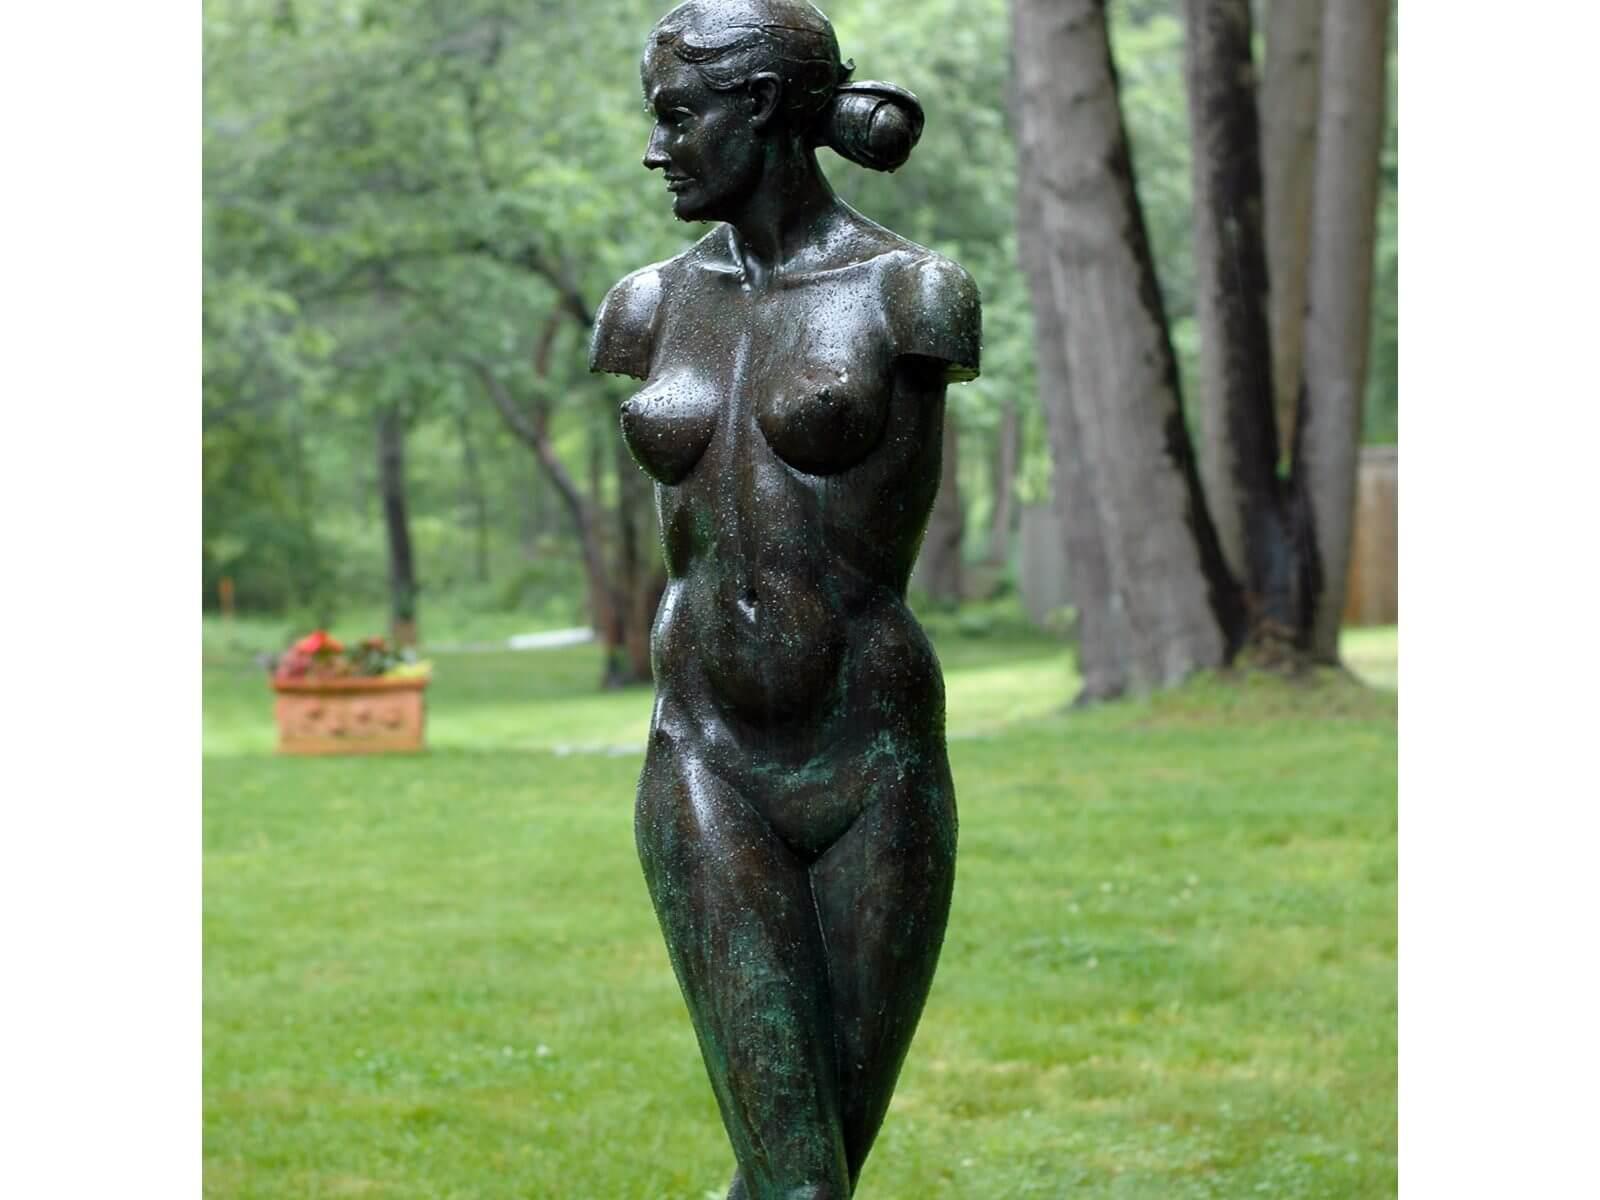 Venus a life size Female nude Bronze Figurative Outdoor Garden Sculpture by Andrew DeVries